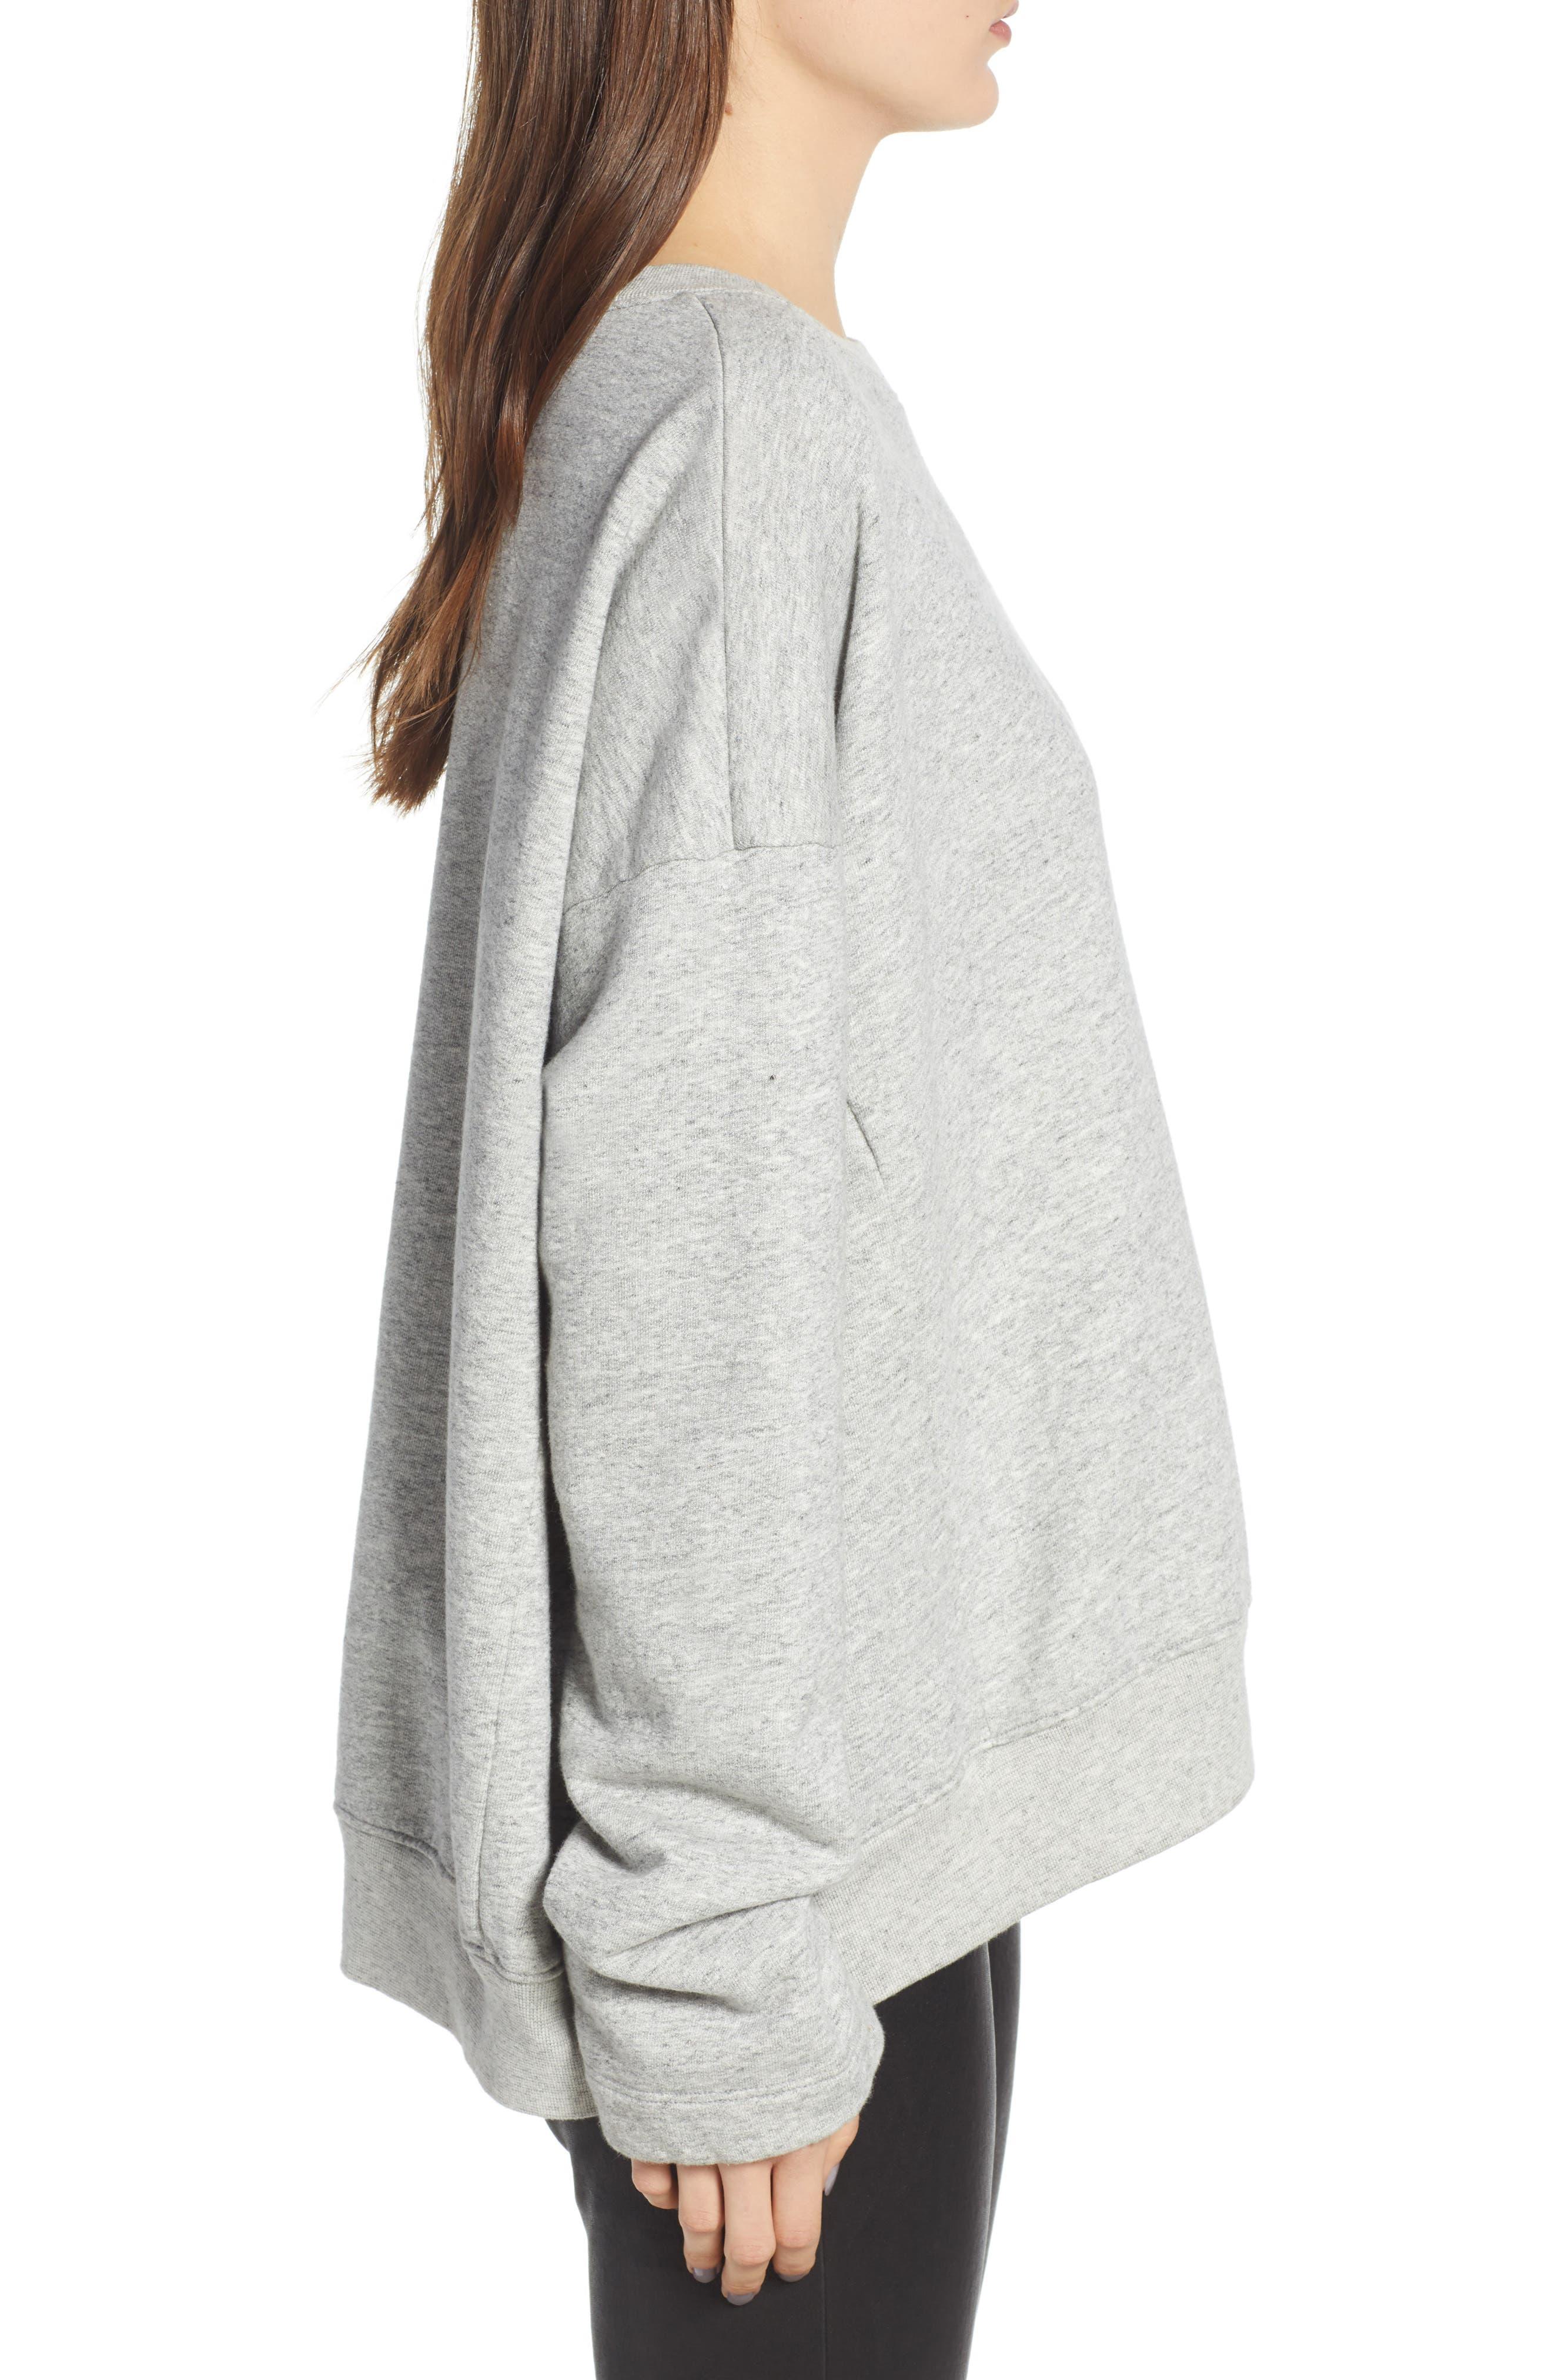 Berdine Oversize Sweatshirt,                             Alternate thumbnail 3, color,                             HEATHER GREY